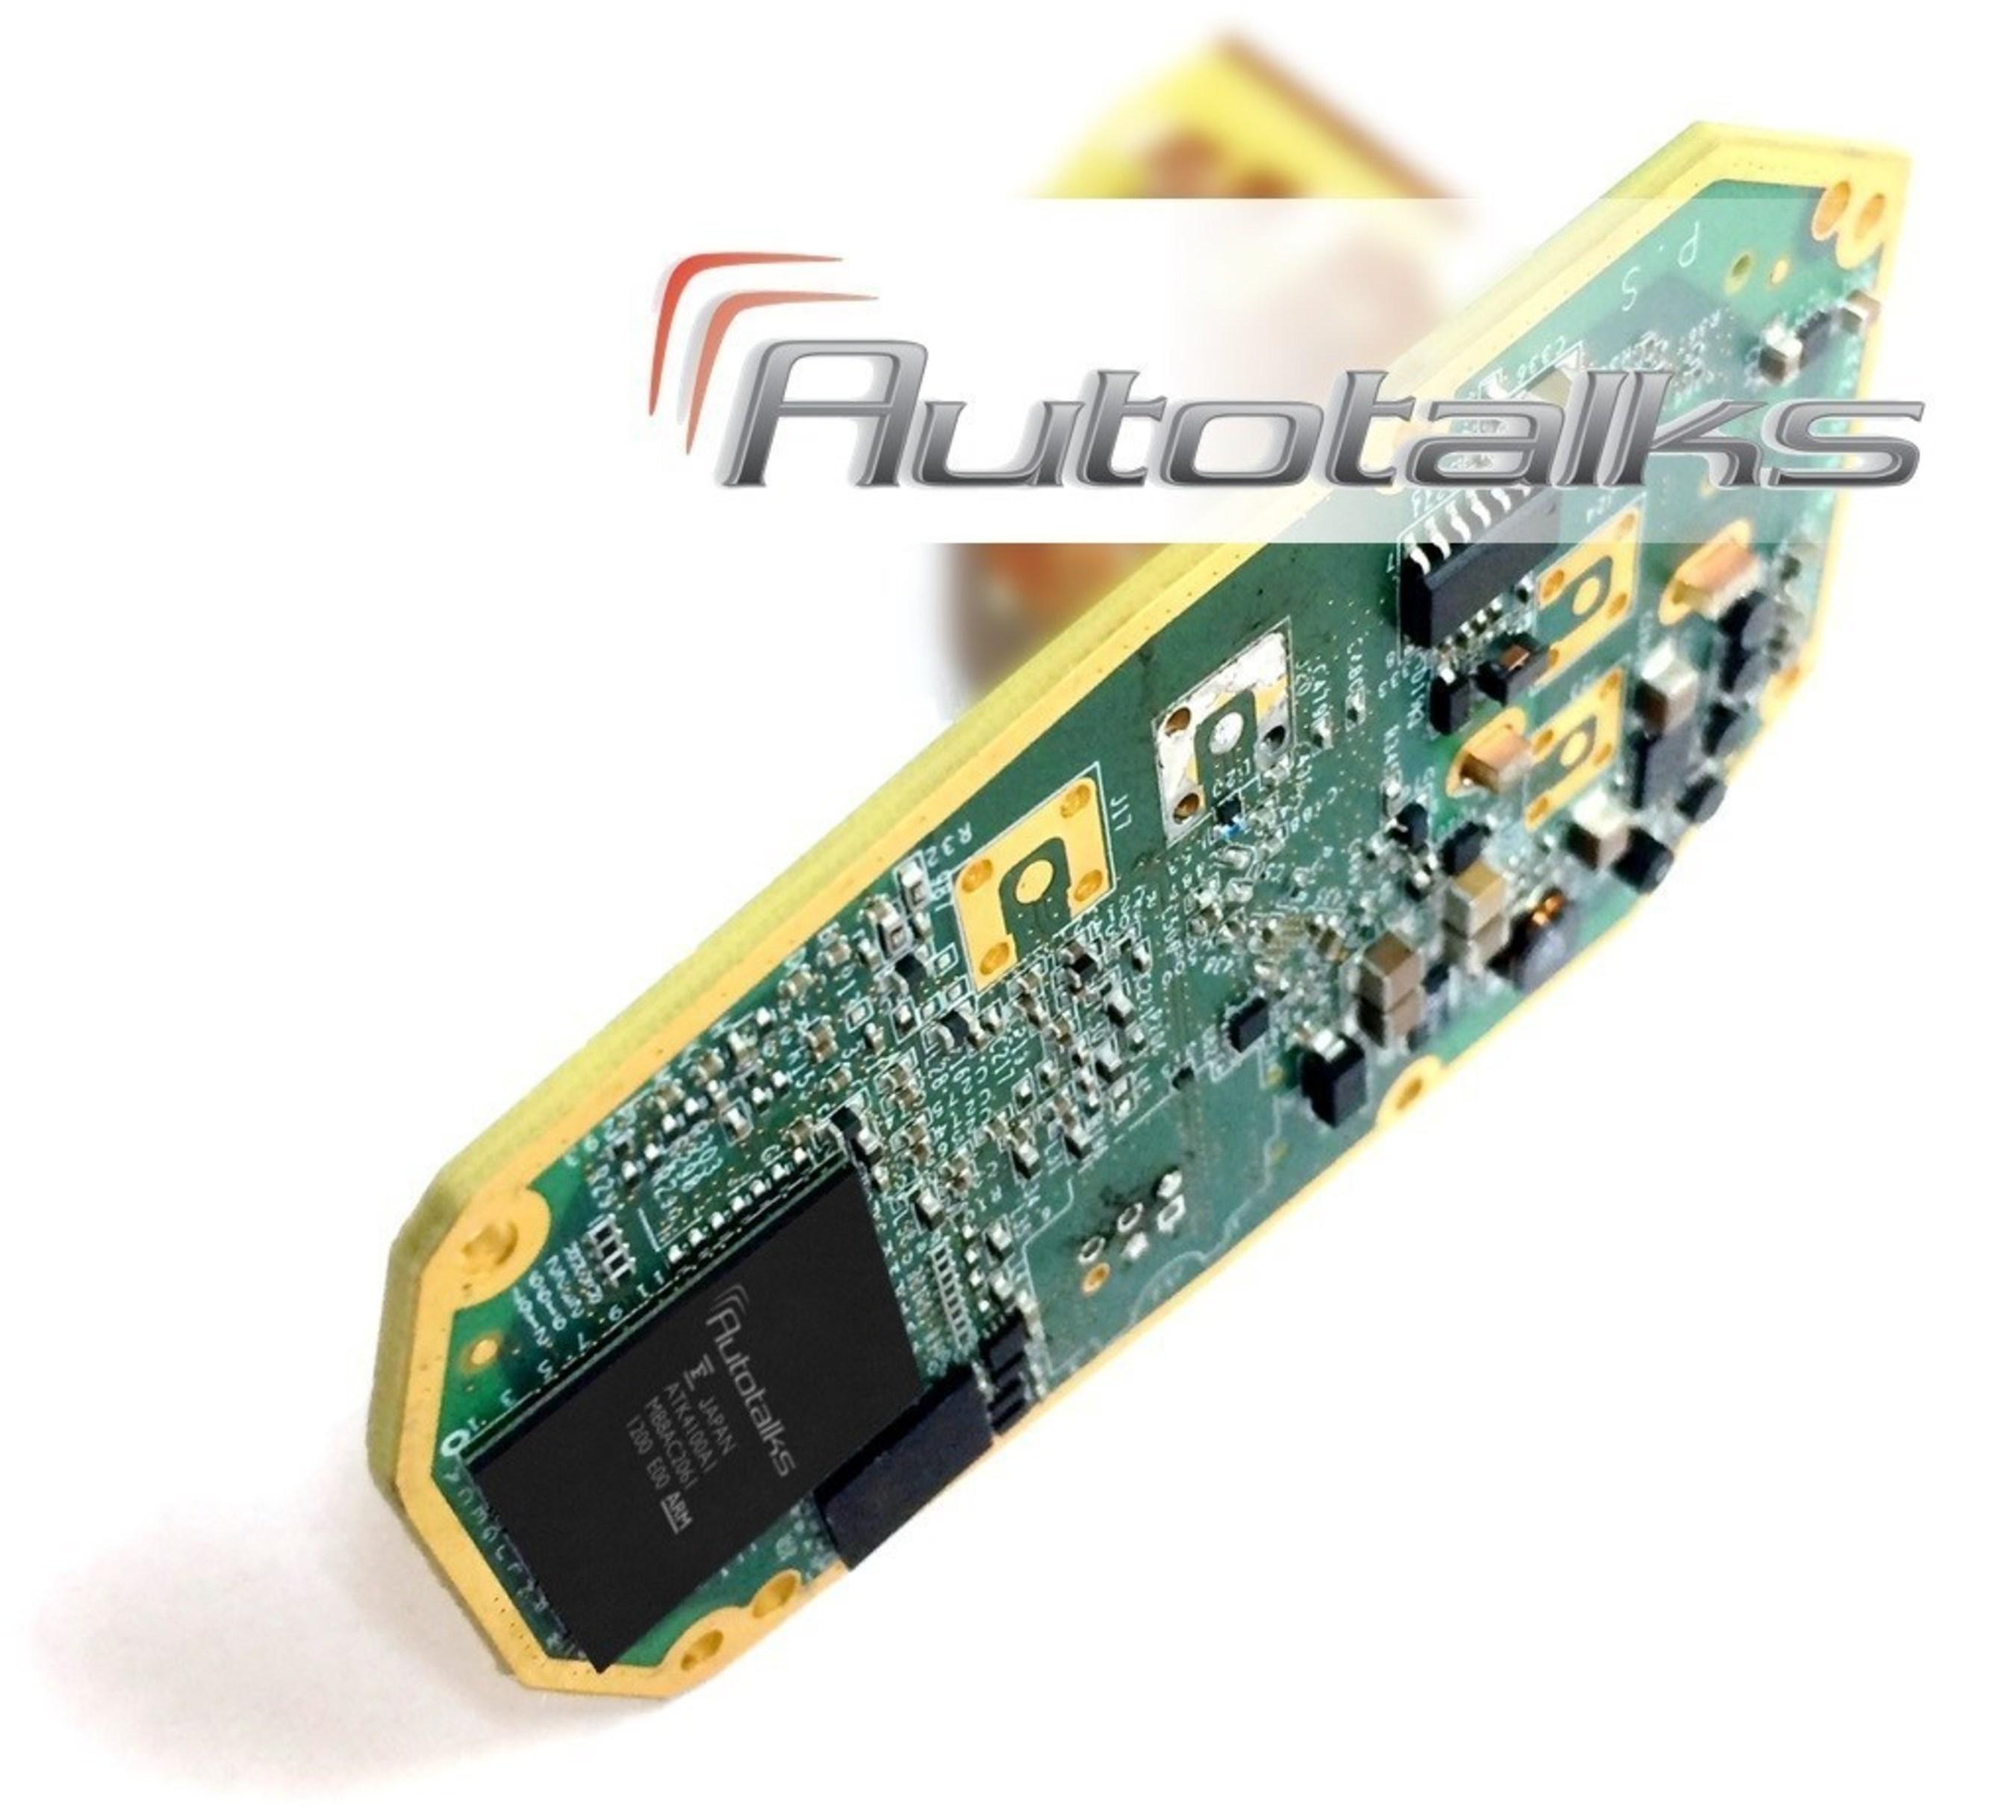 AUDI series-production ready smart antenna